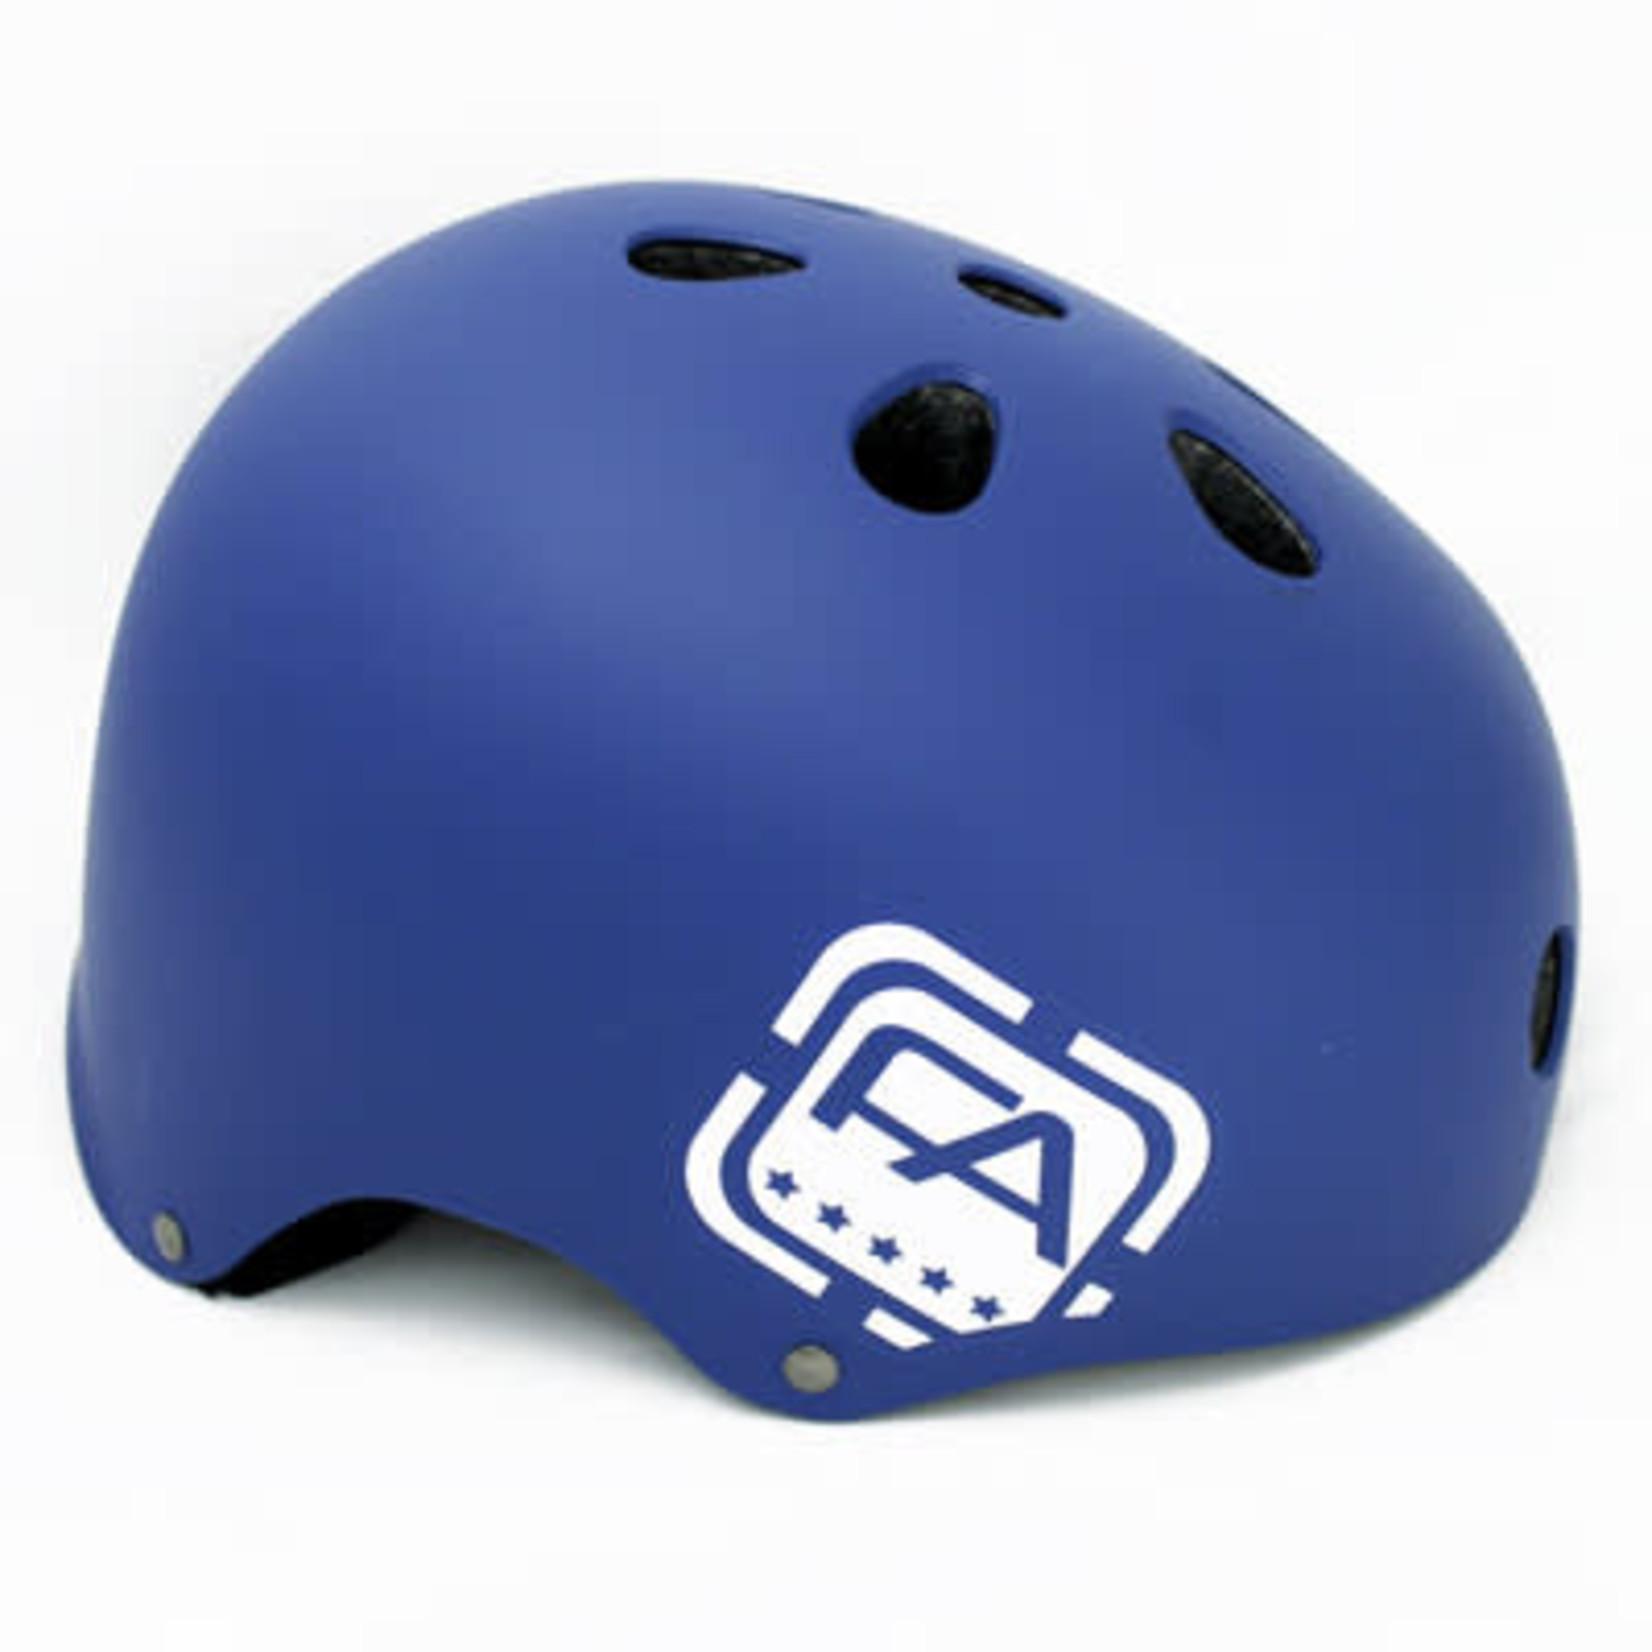 Free Agent Street Helmet